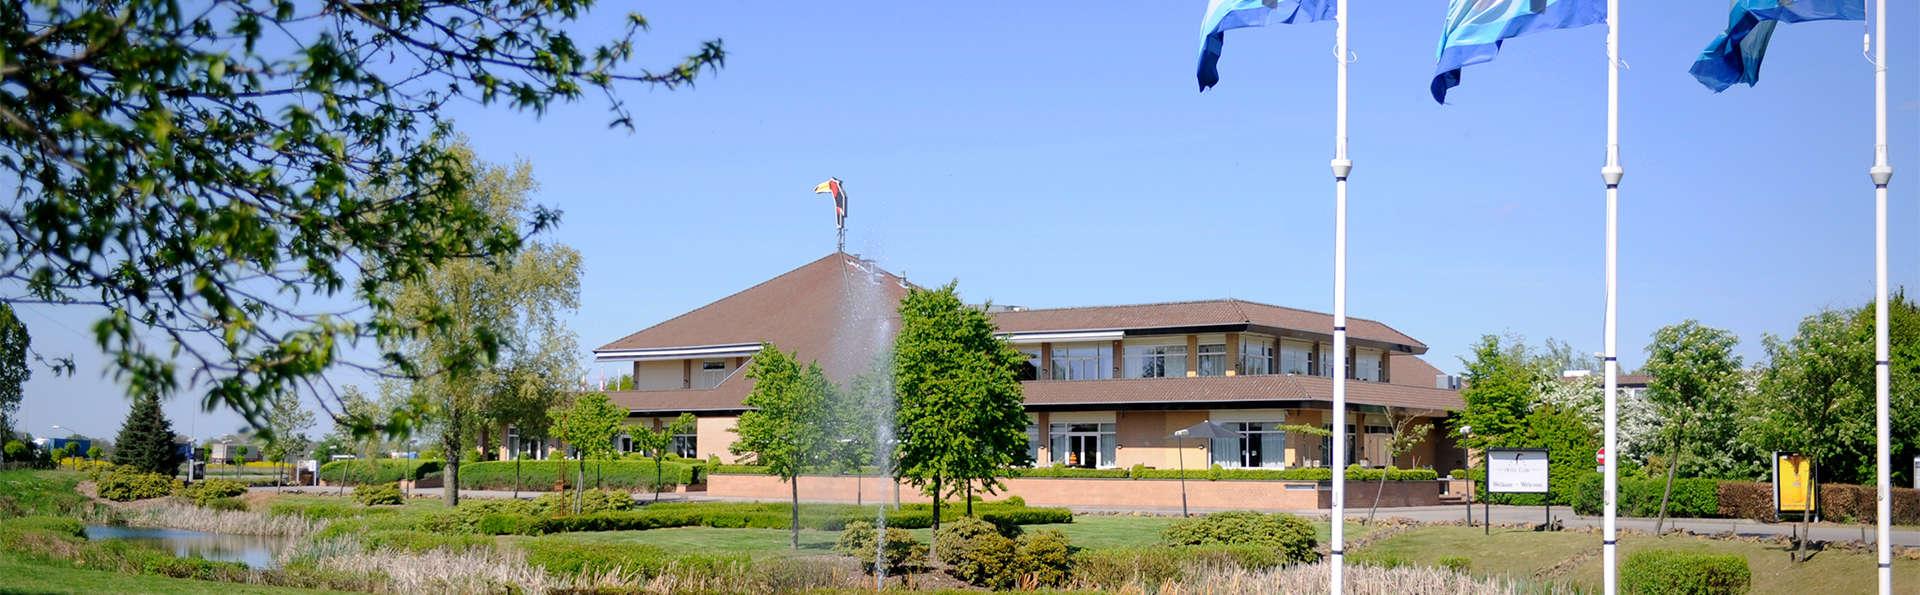 Van der Valk Hotel Cuijk-Nijmegen  - EDIT_Exterior.jpg